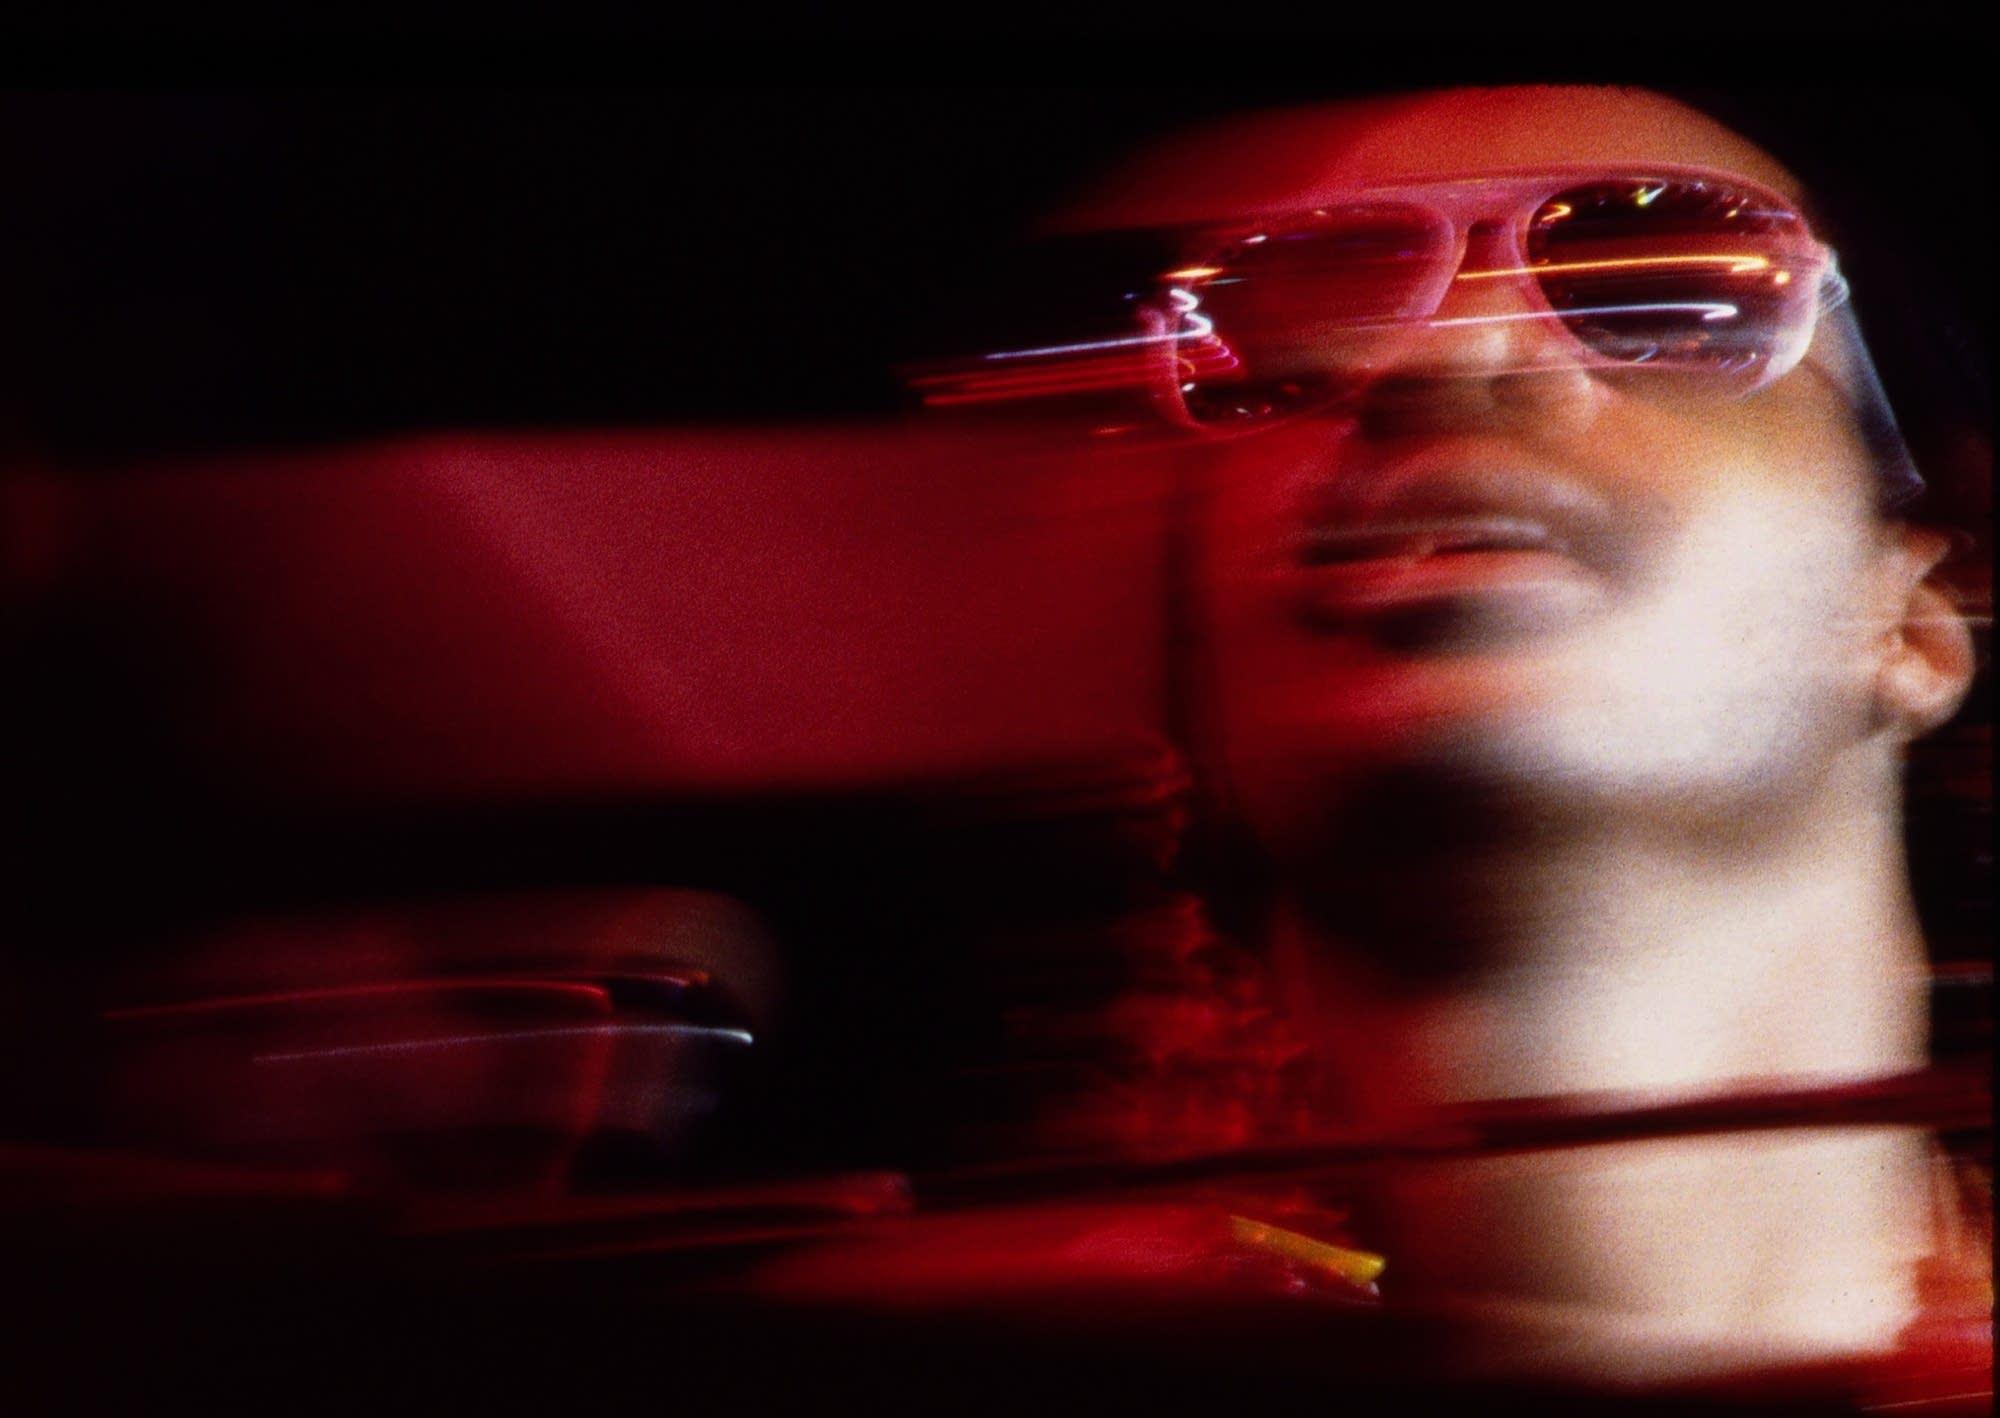 Bruce Talamon's photo of Stevie Wonder